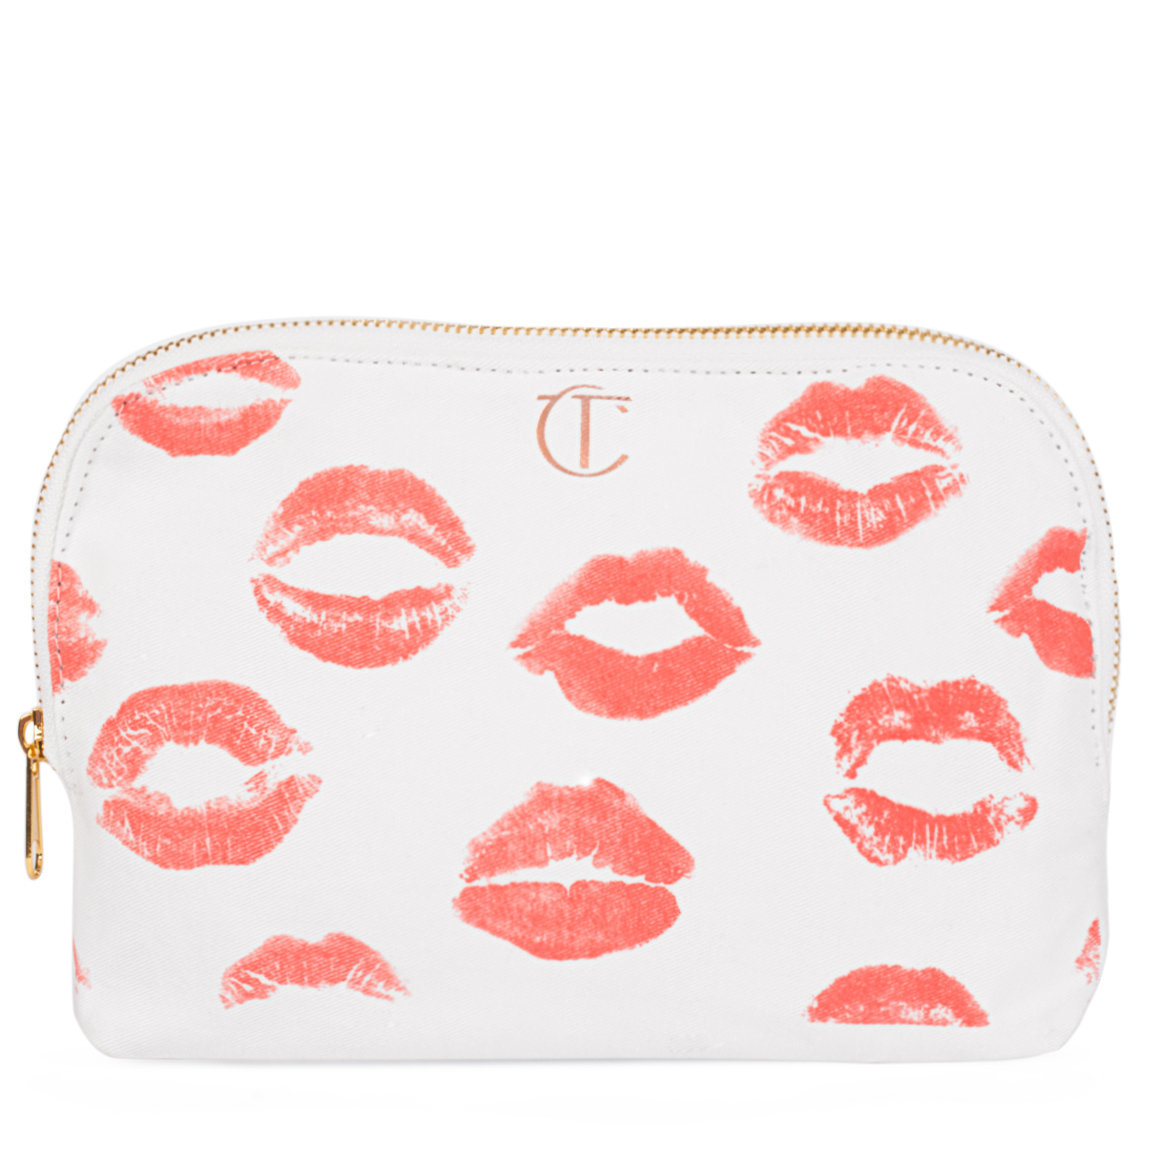 Charlotte Tilbury Makeup Bag alternative view 1 - product swatch.